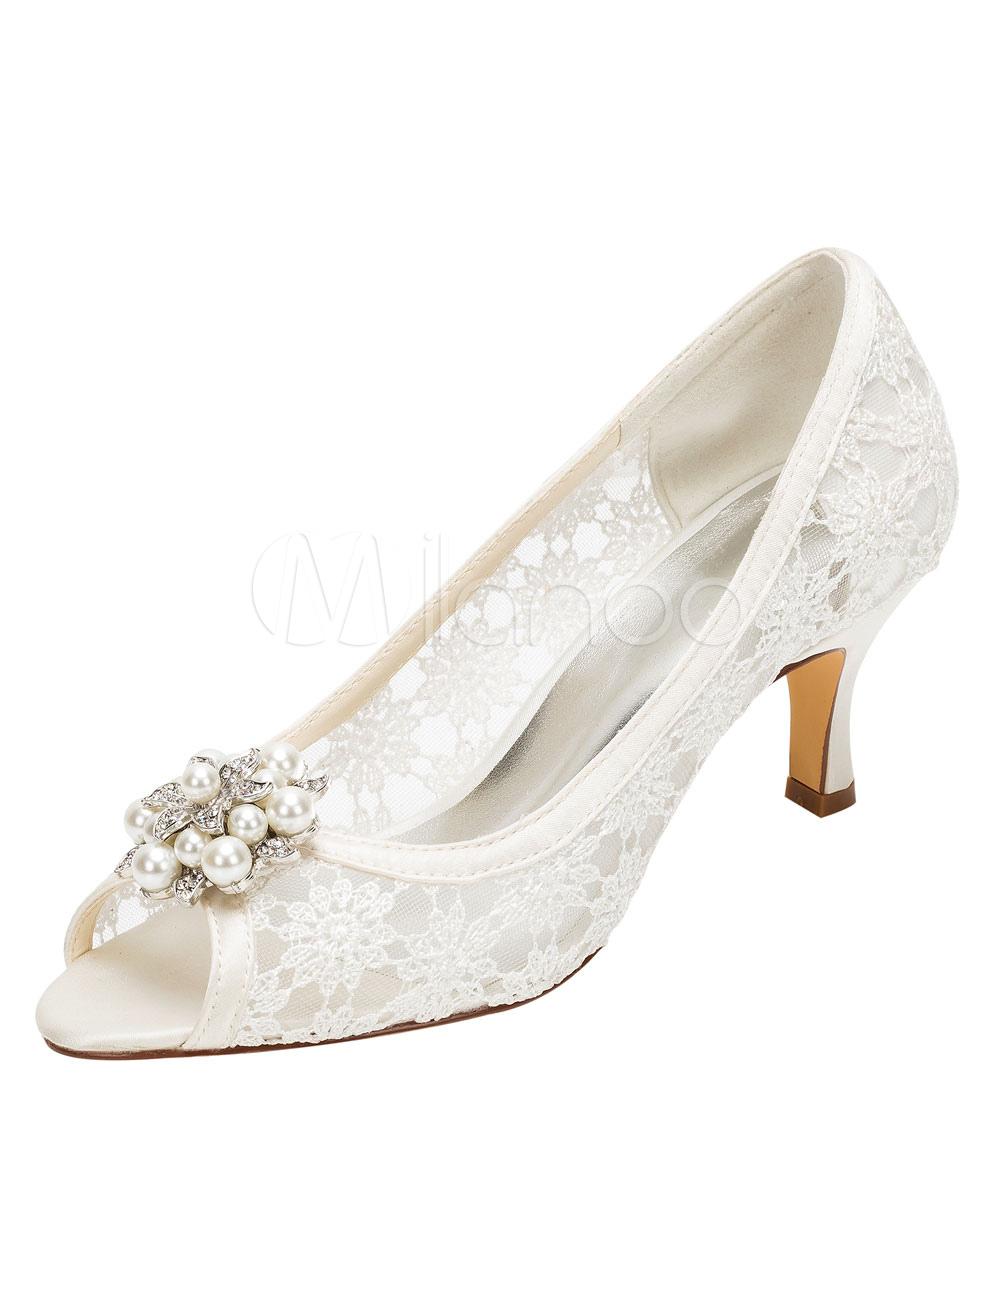 Lace Wedding Shoes High Heel Ivory Peep Pumps Pearl Rhinestone Slip-on Bridal Shoes